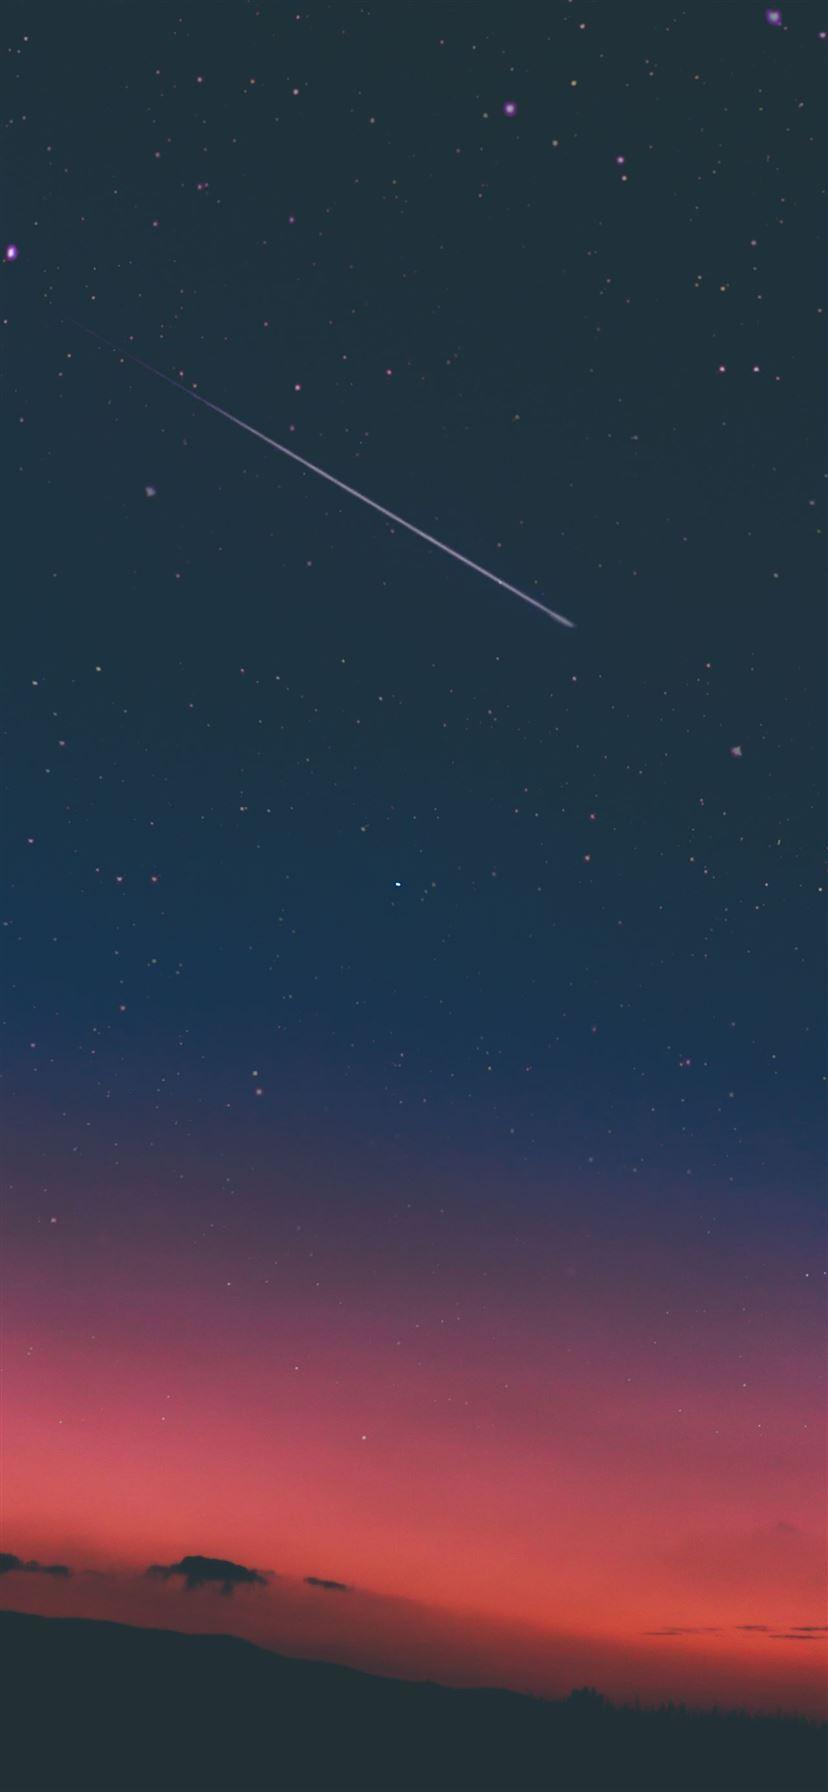 Best Space Iphone 11 Wallpapers Hd Ilikewallpaper